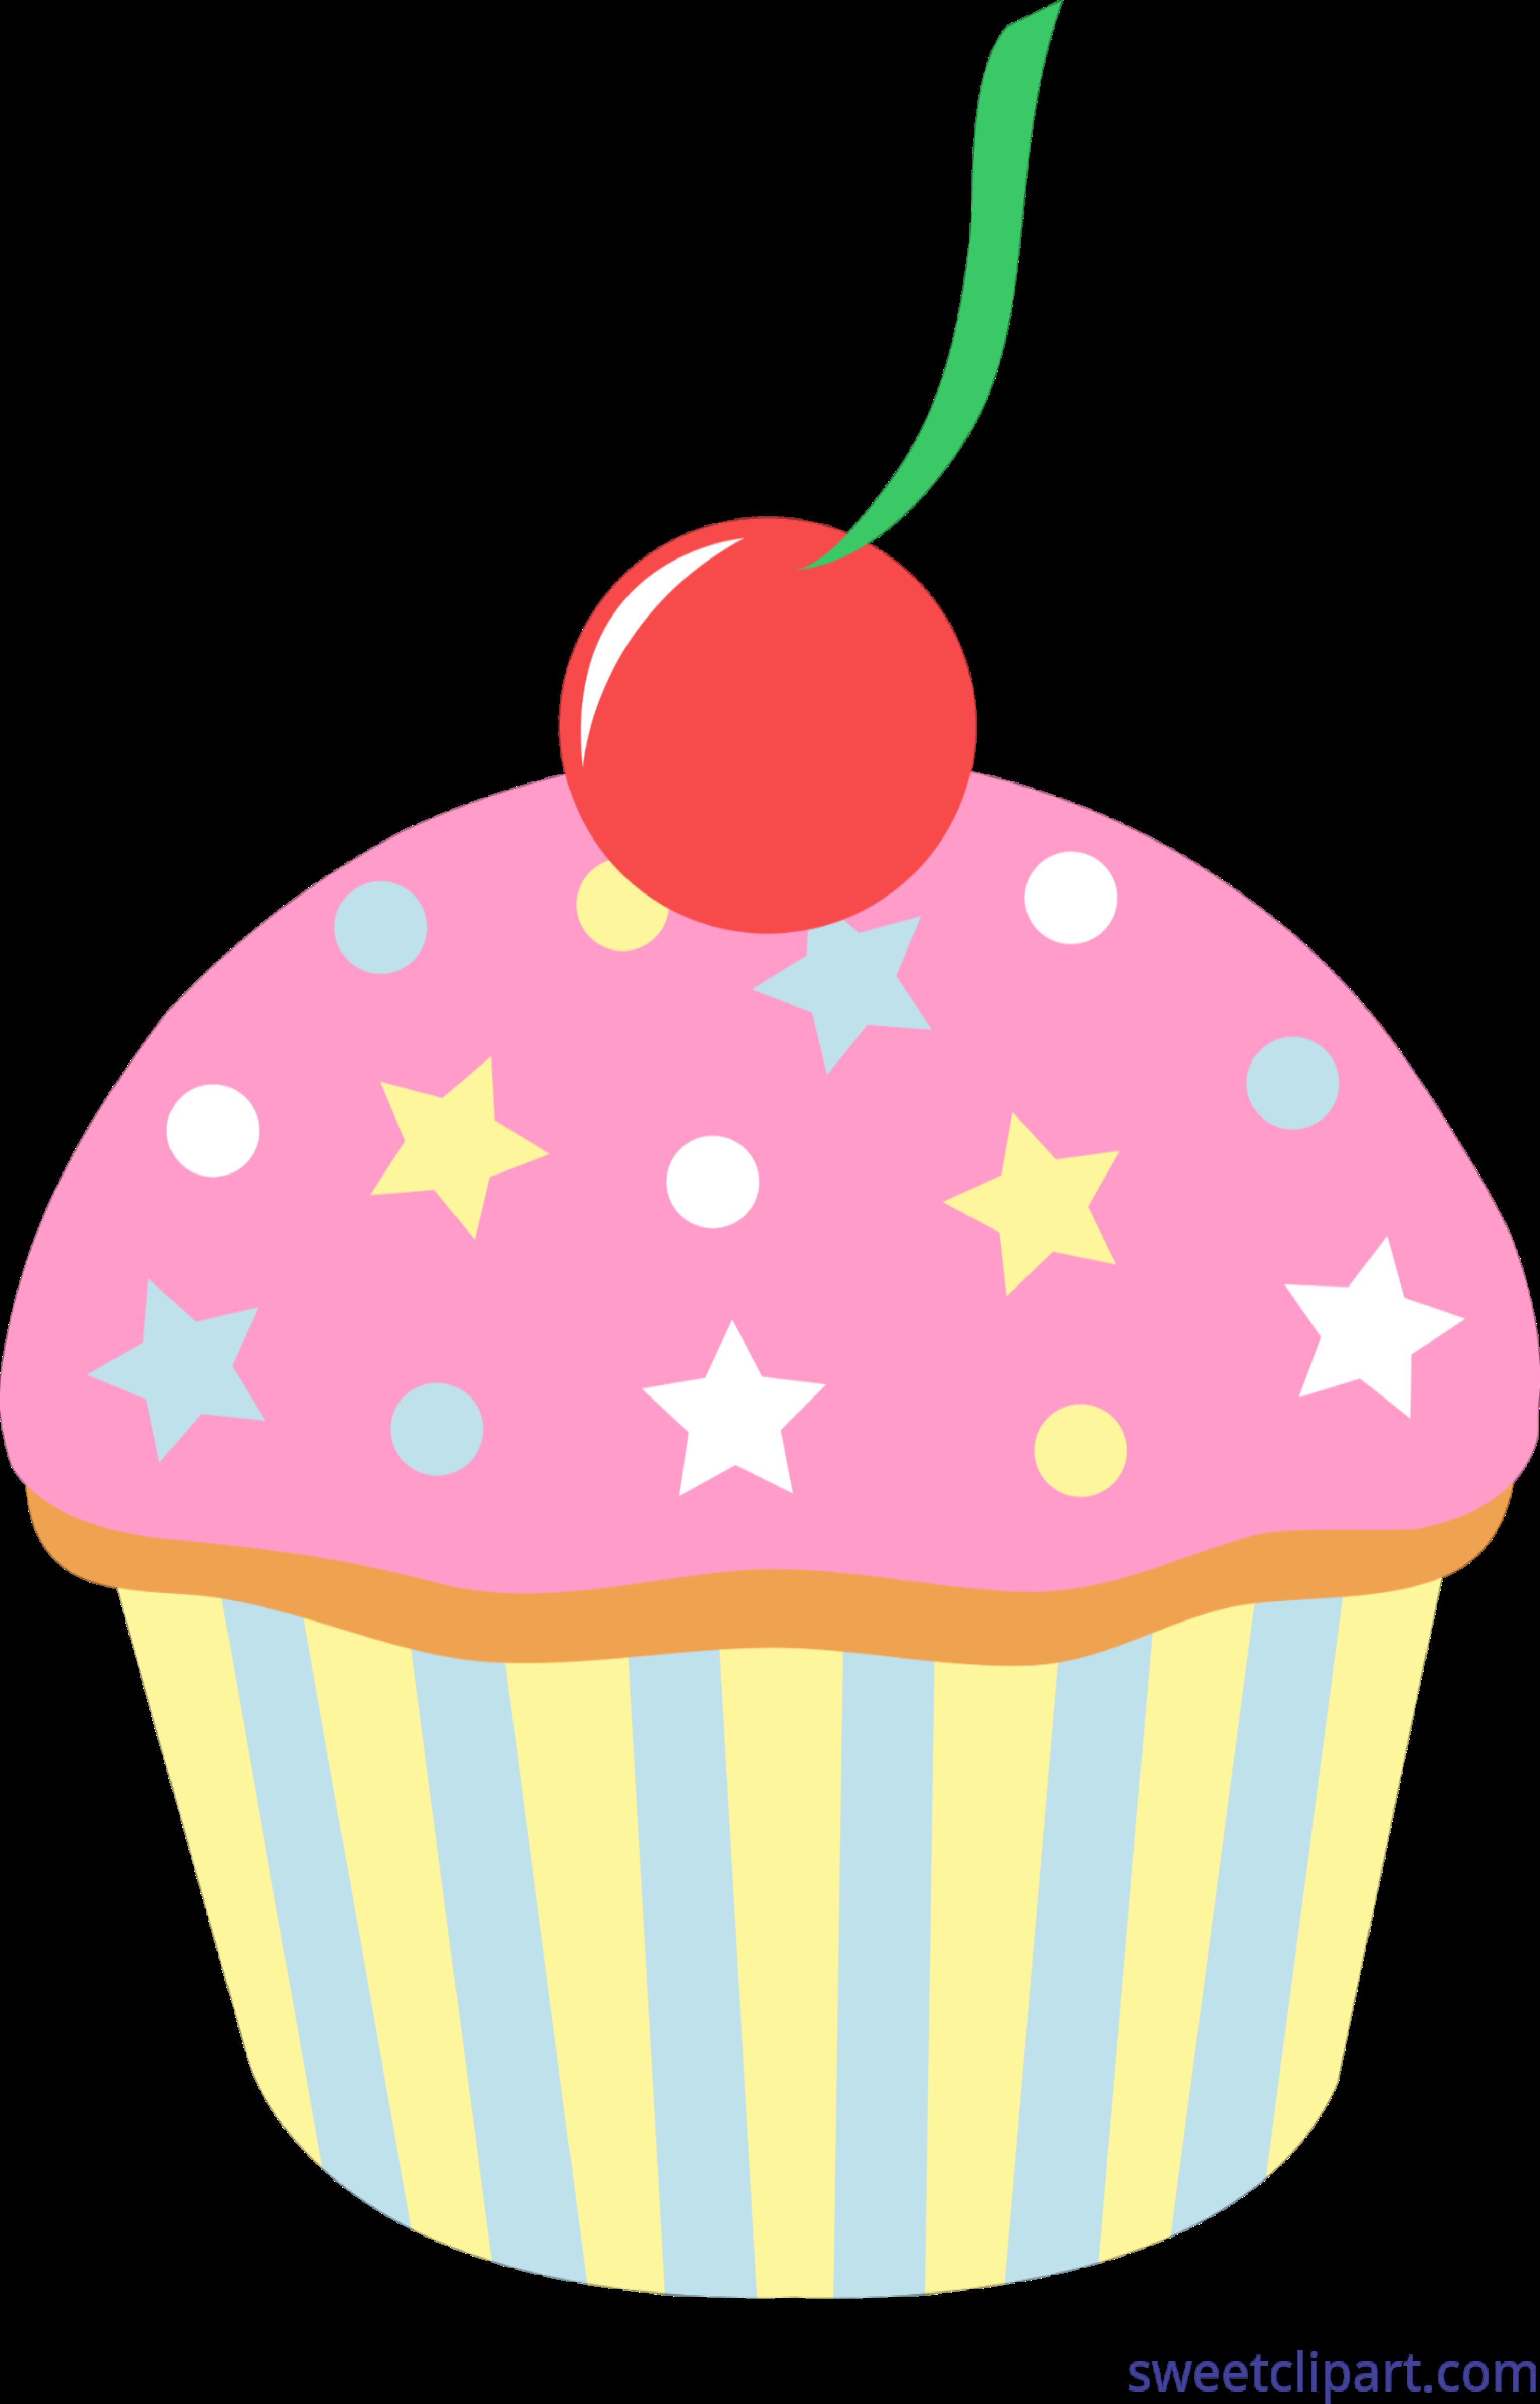 Cupcake strawberry sprinkles clip. Strawberries clipart cherry